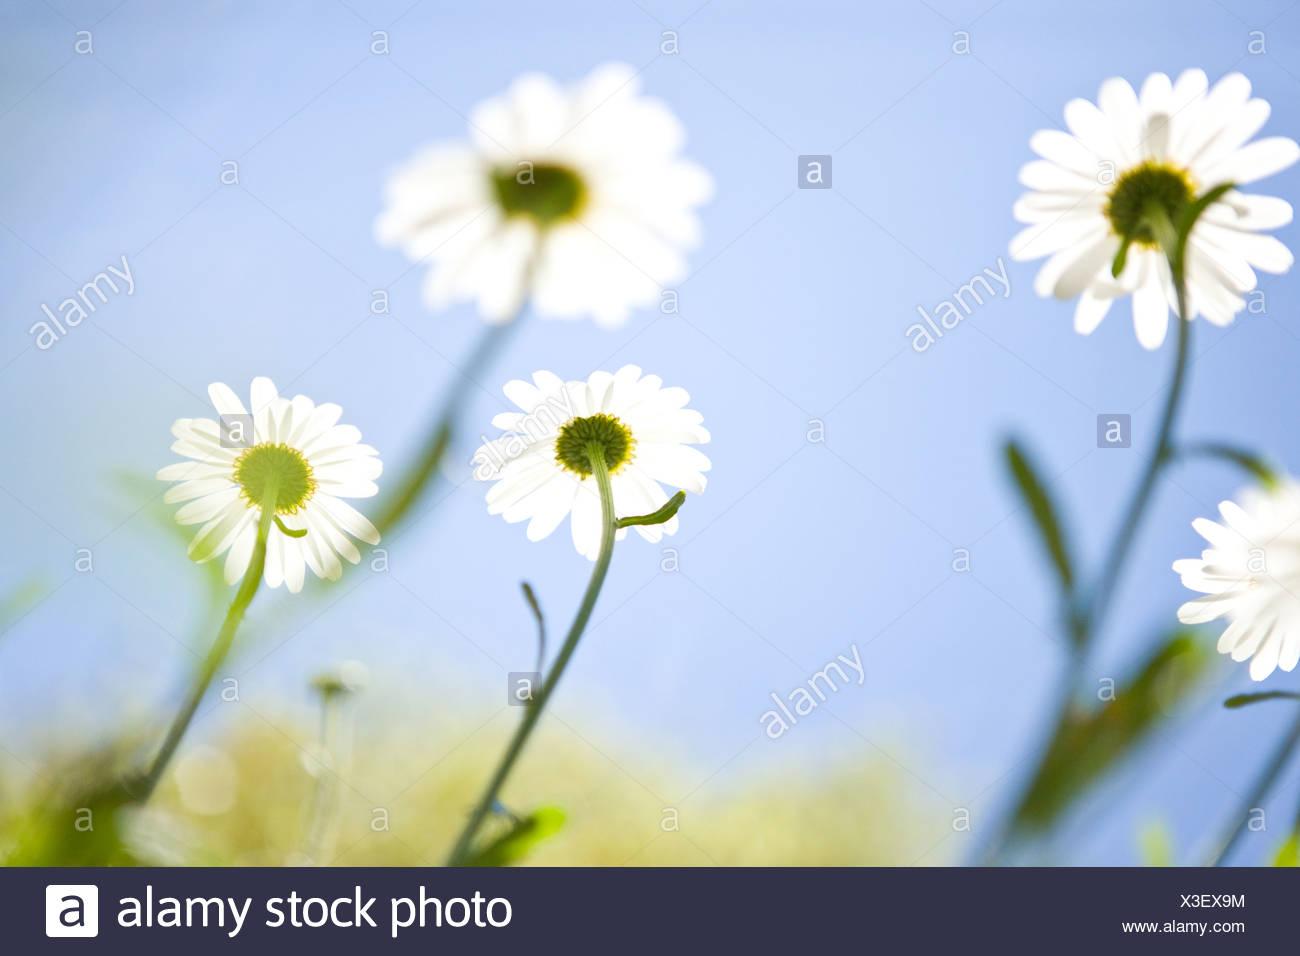 Ox-eye daisies against a summer sky - Stock Image